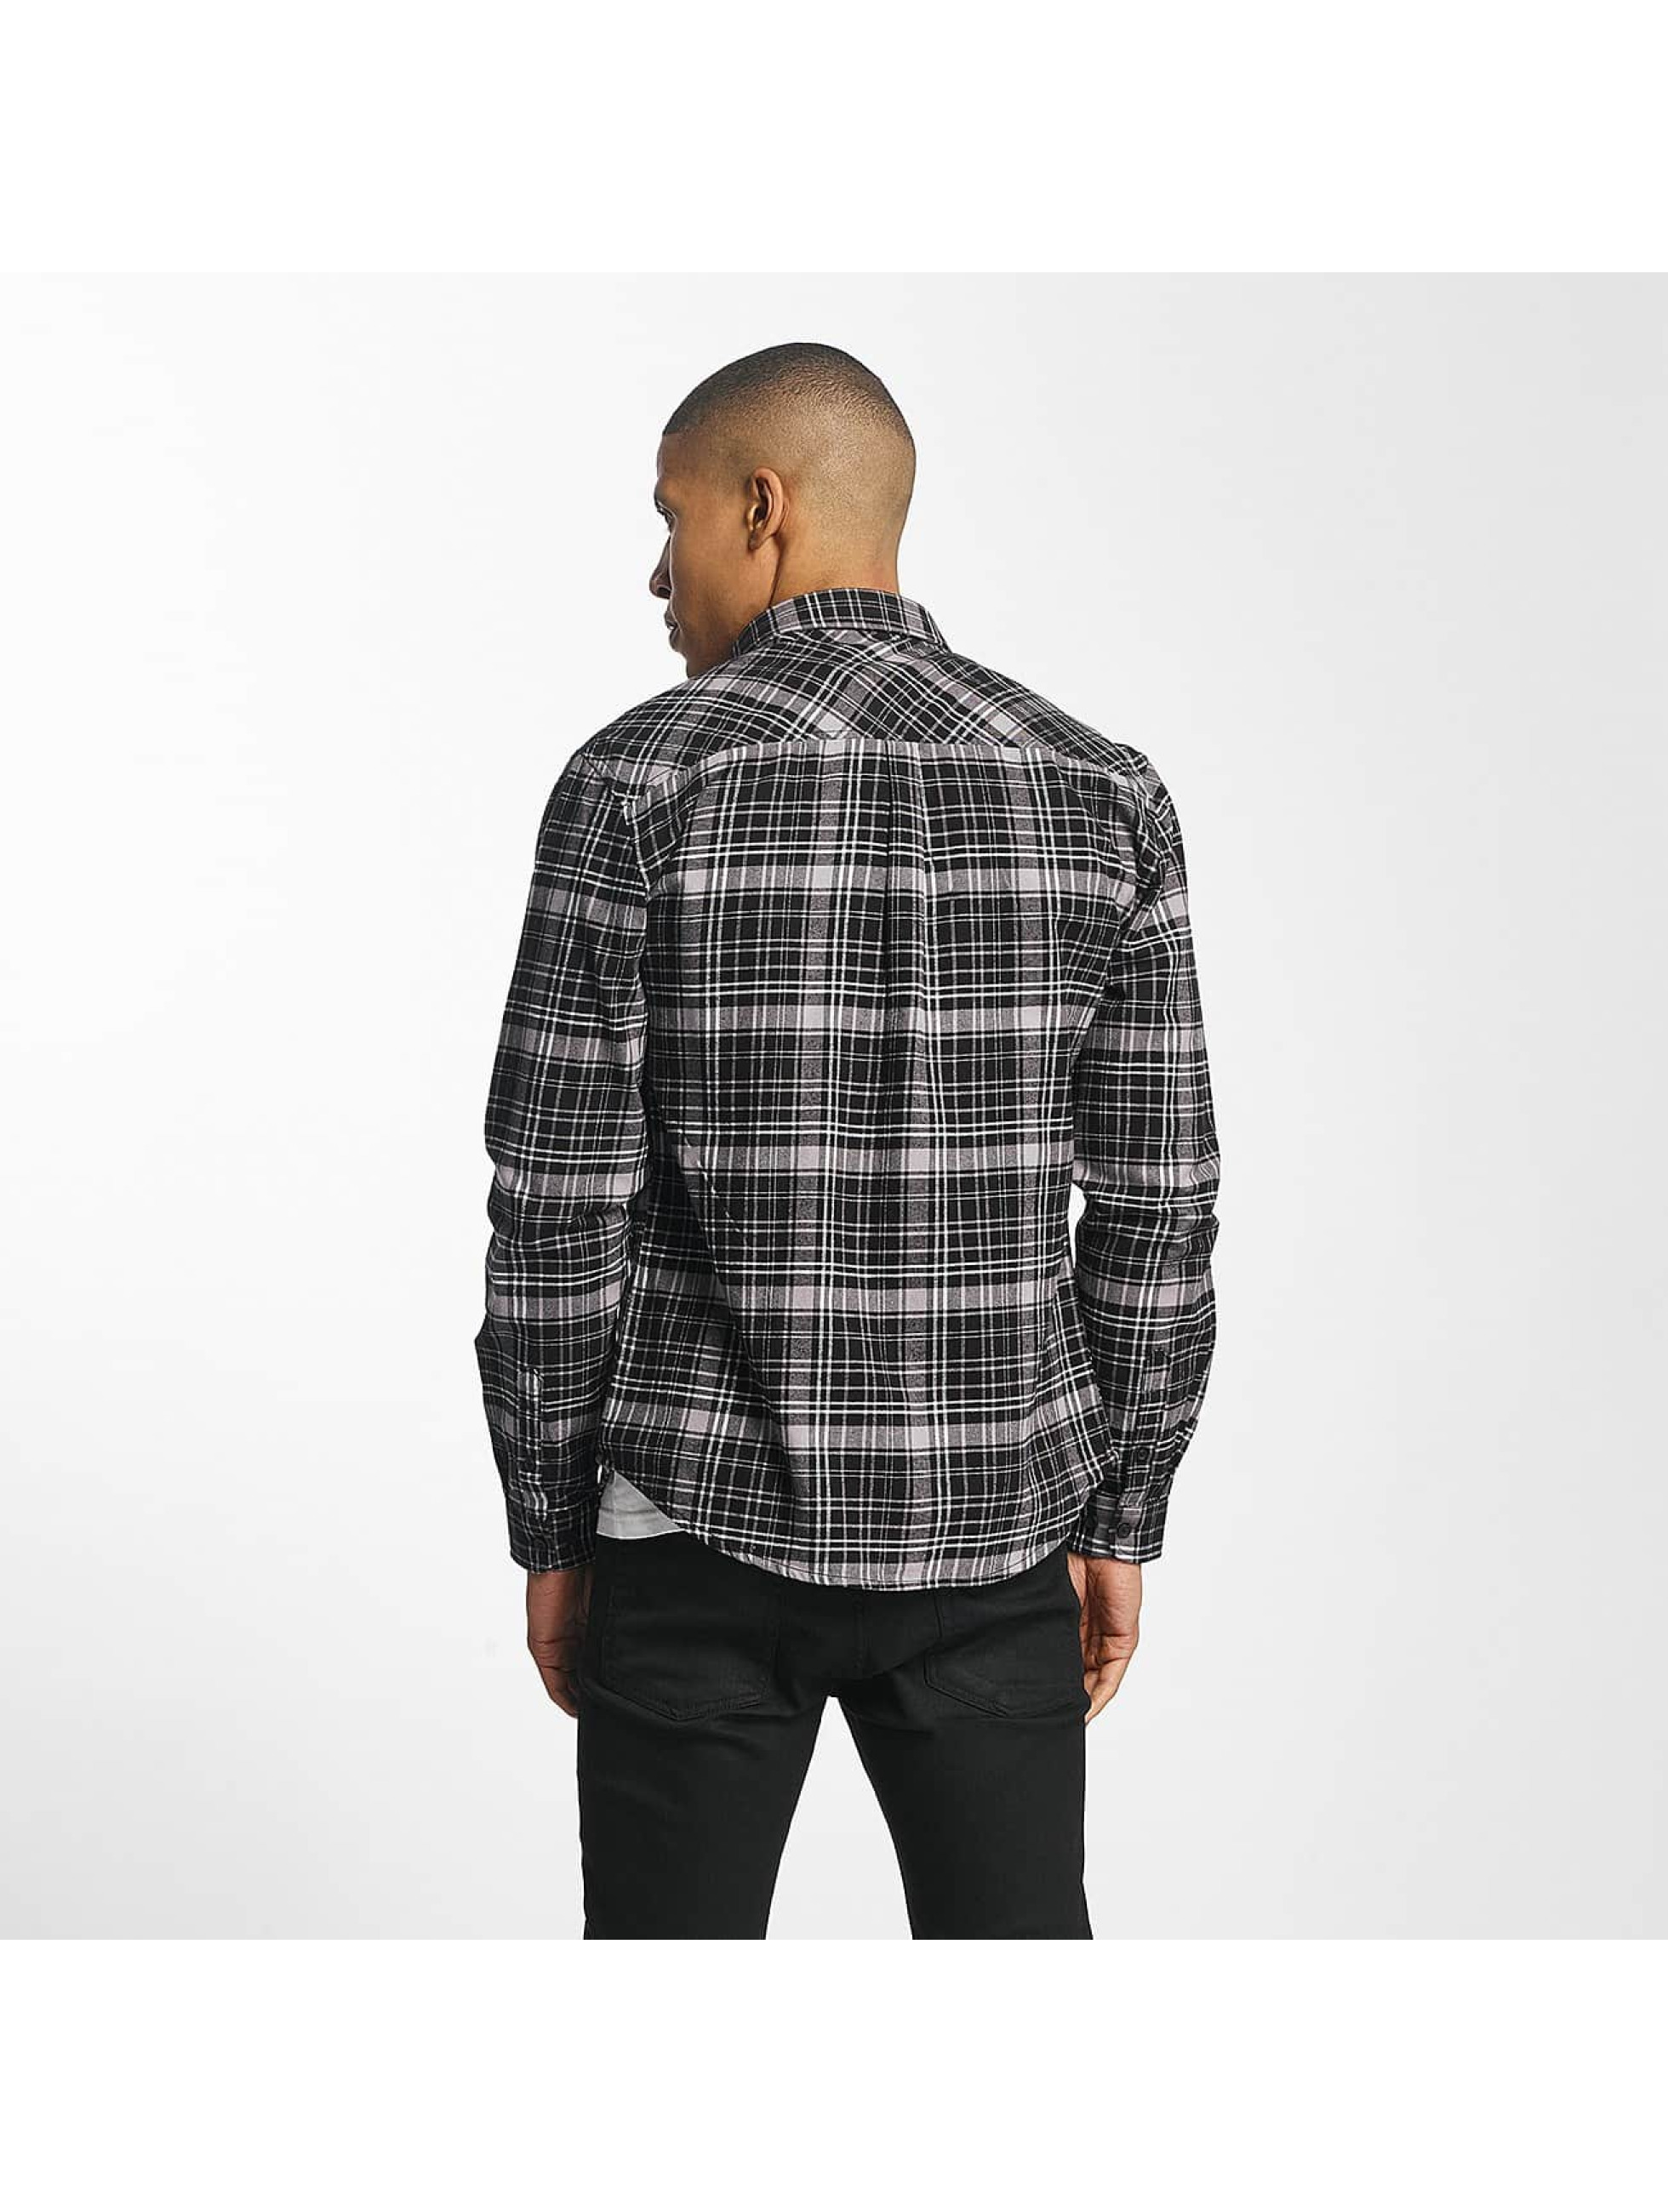 SHINE Original Koszule Luis Checked czarny